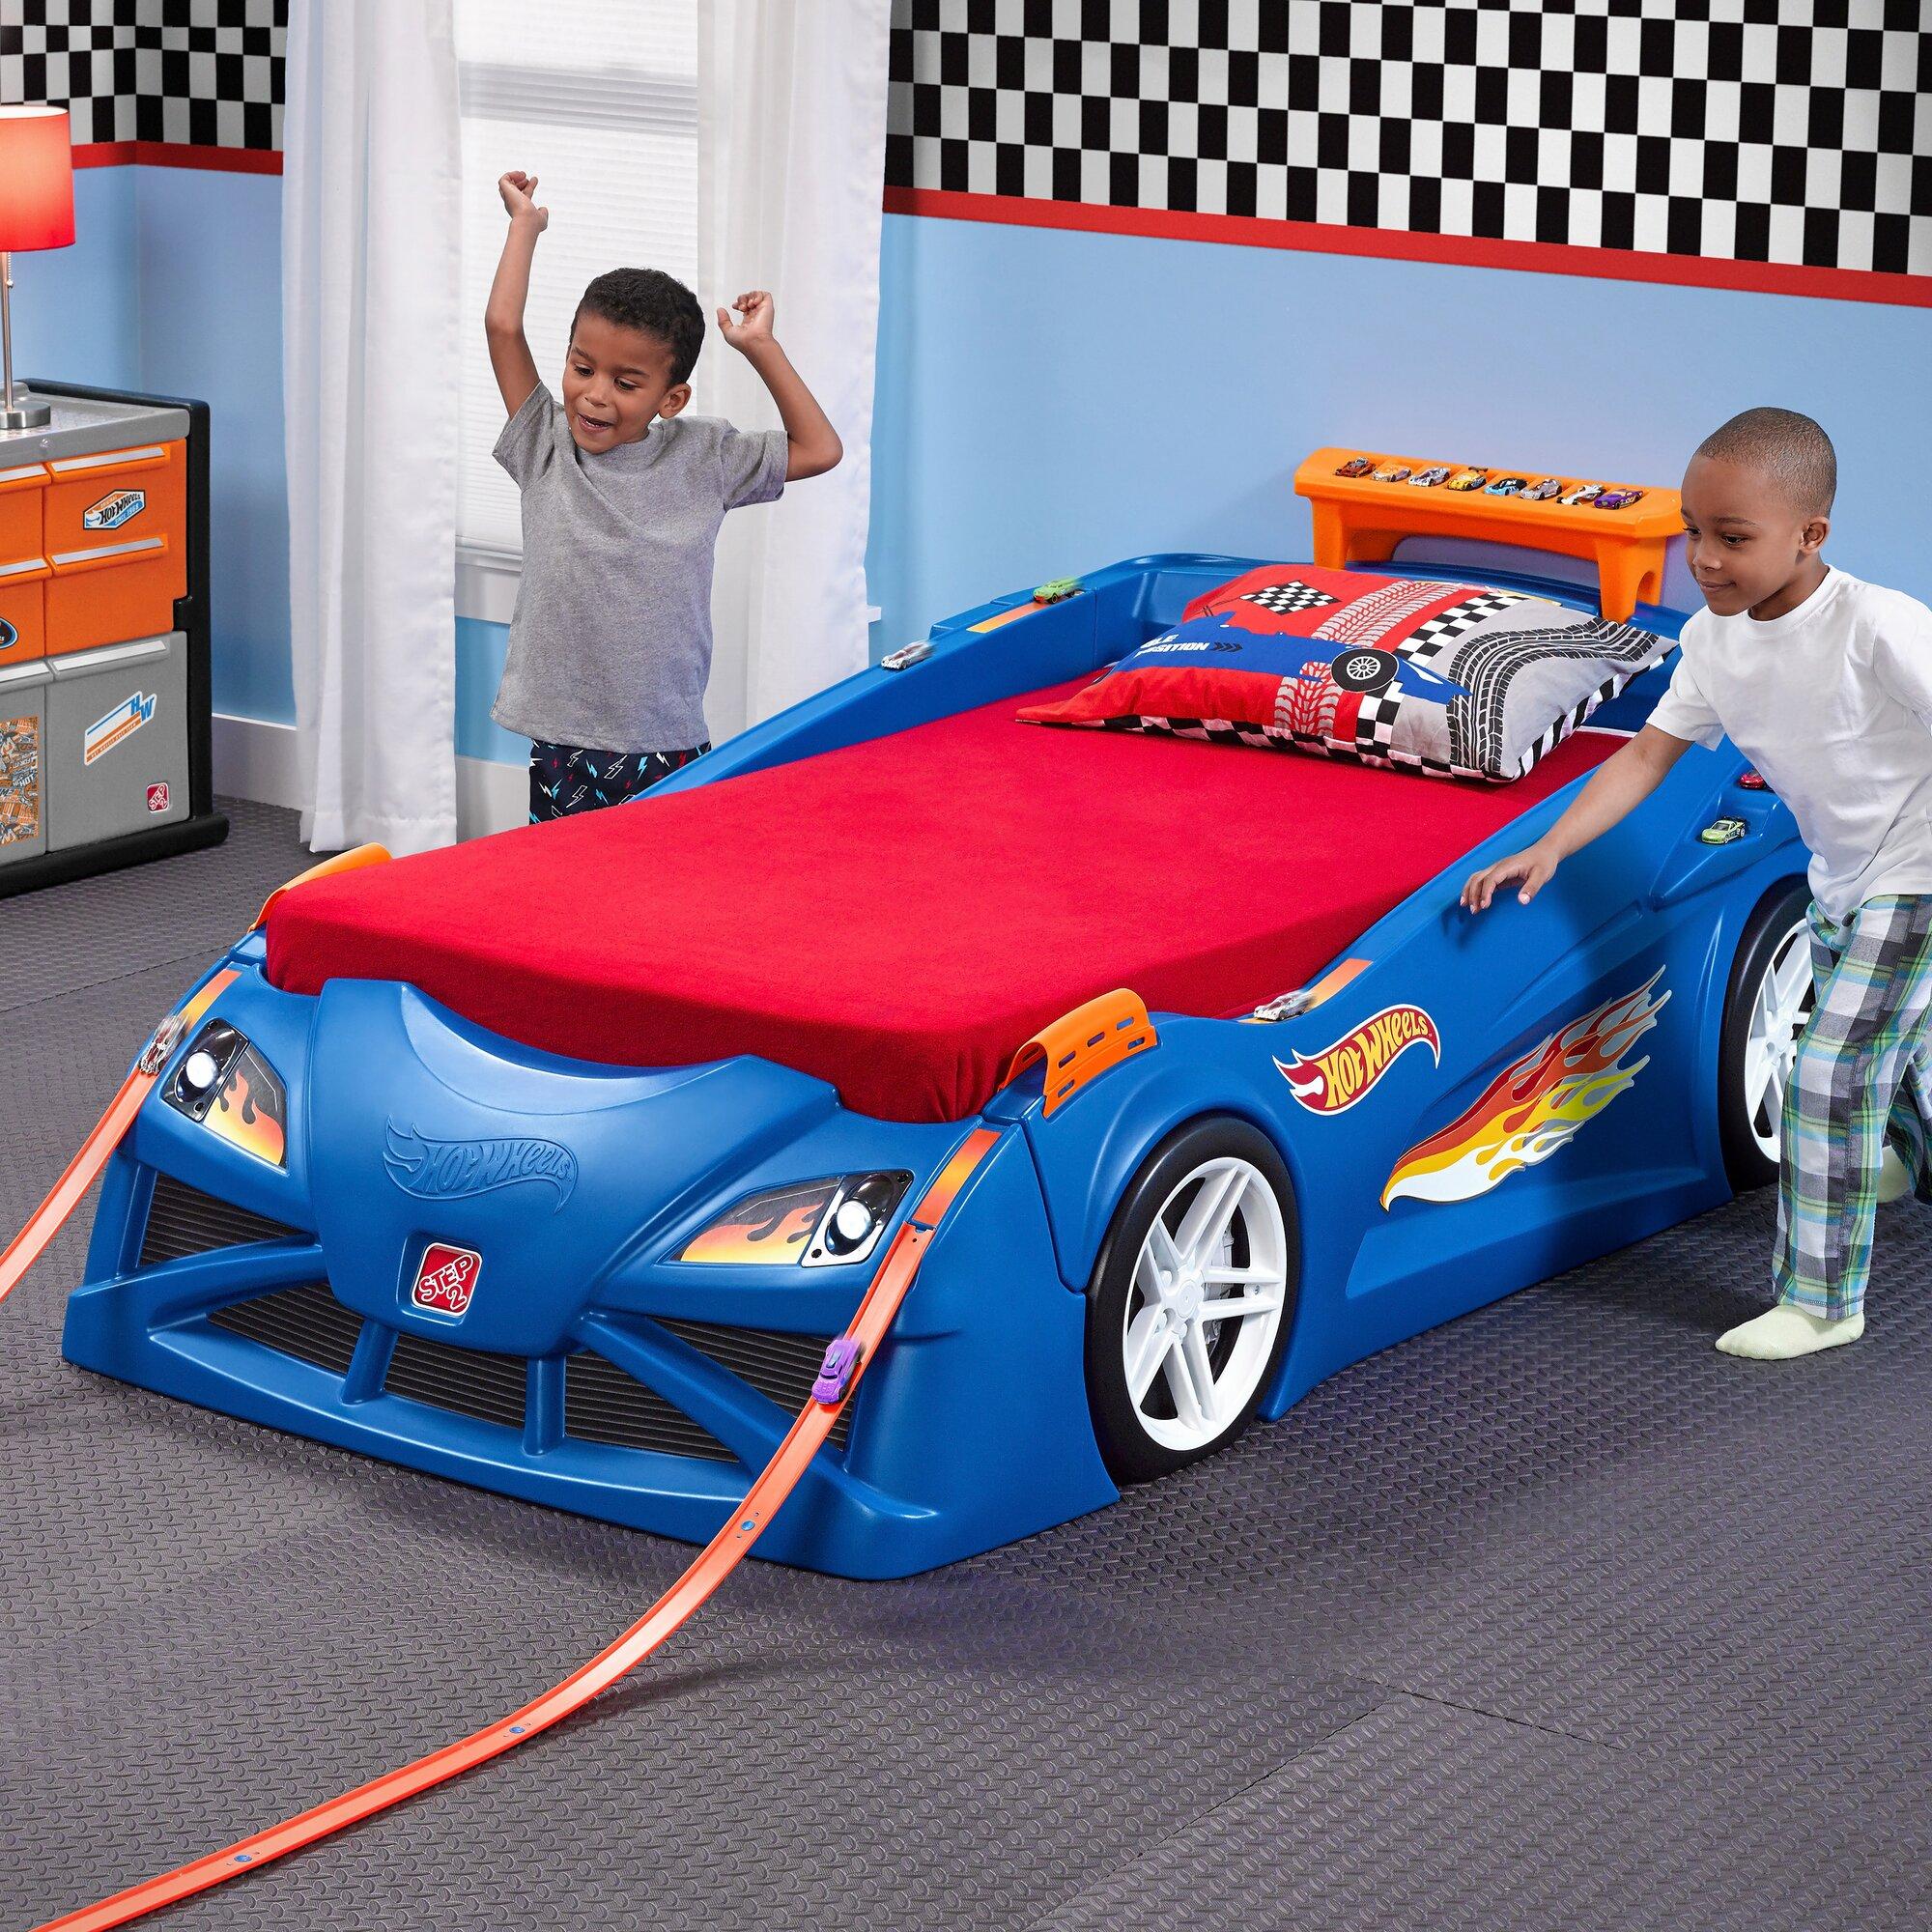 Thomas The Train Bedroom Decor Step2 Hot Wheels Race Twin Car Bed Amp Reviews Wayfair